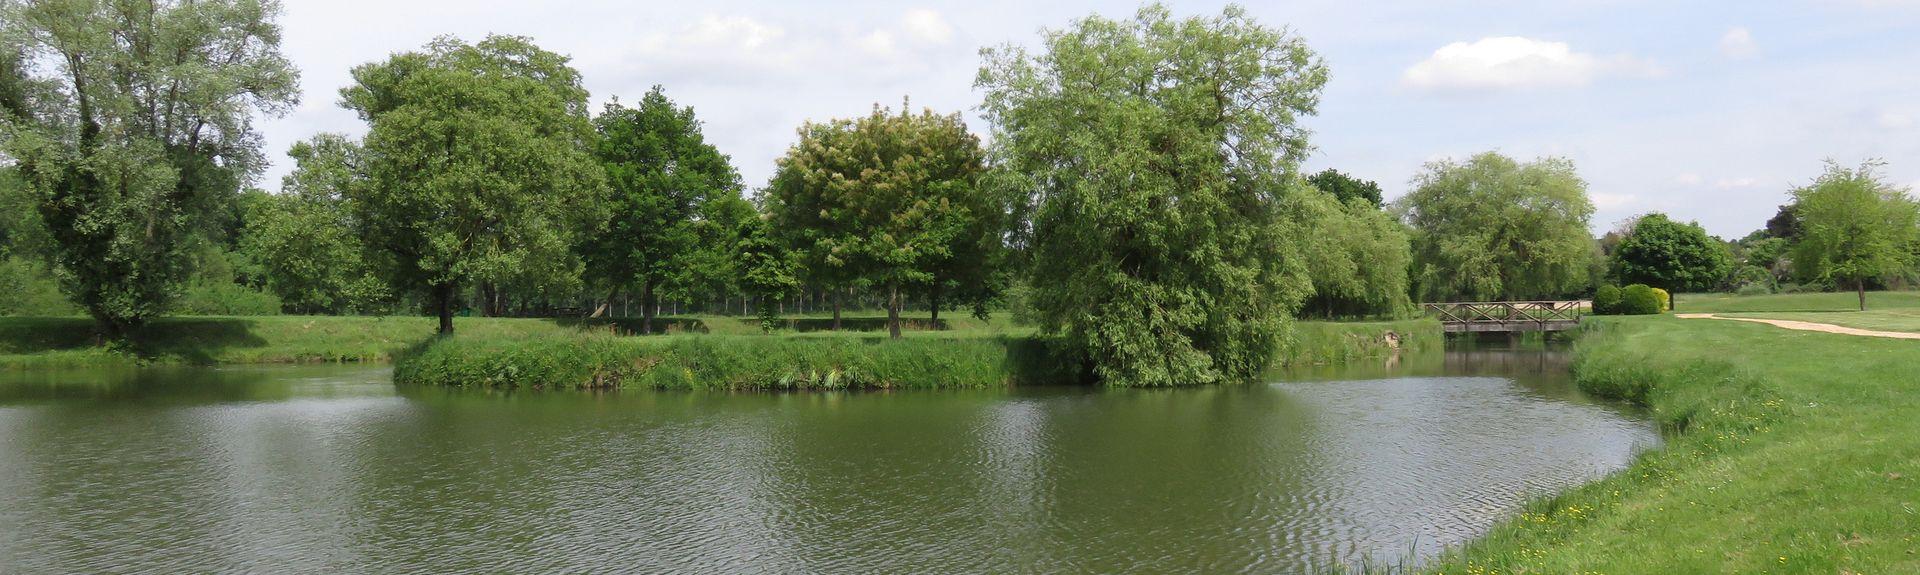 Villandry, Centre/Loire-Tal, Frankreich